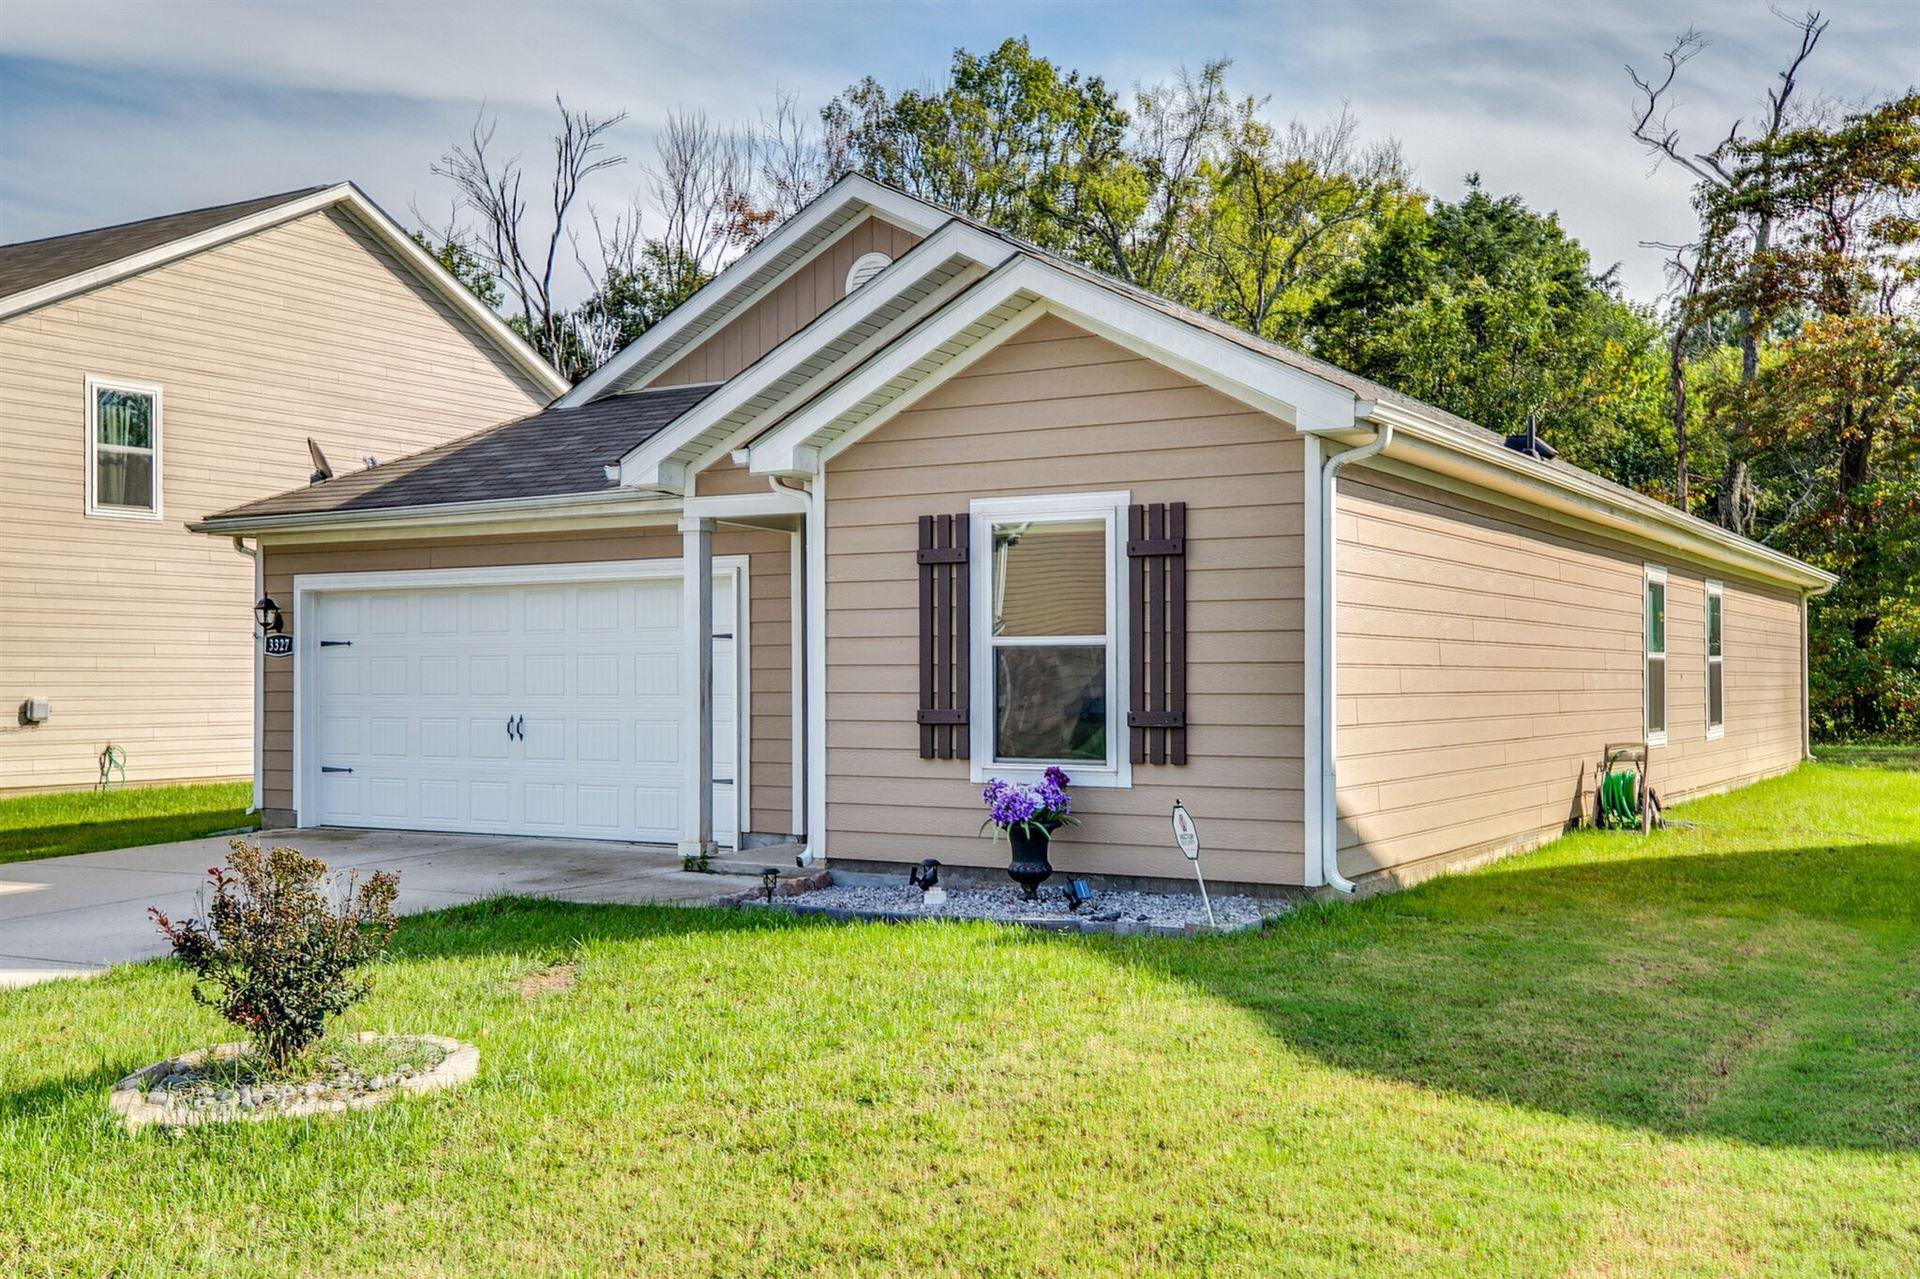 Photo of 3327 Drysdale Dr, Murfreesboro, TN 37128 (MLS # 2298787)